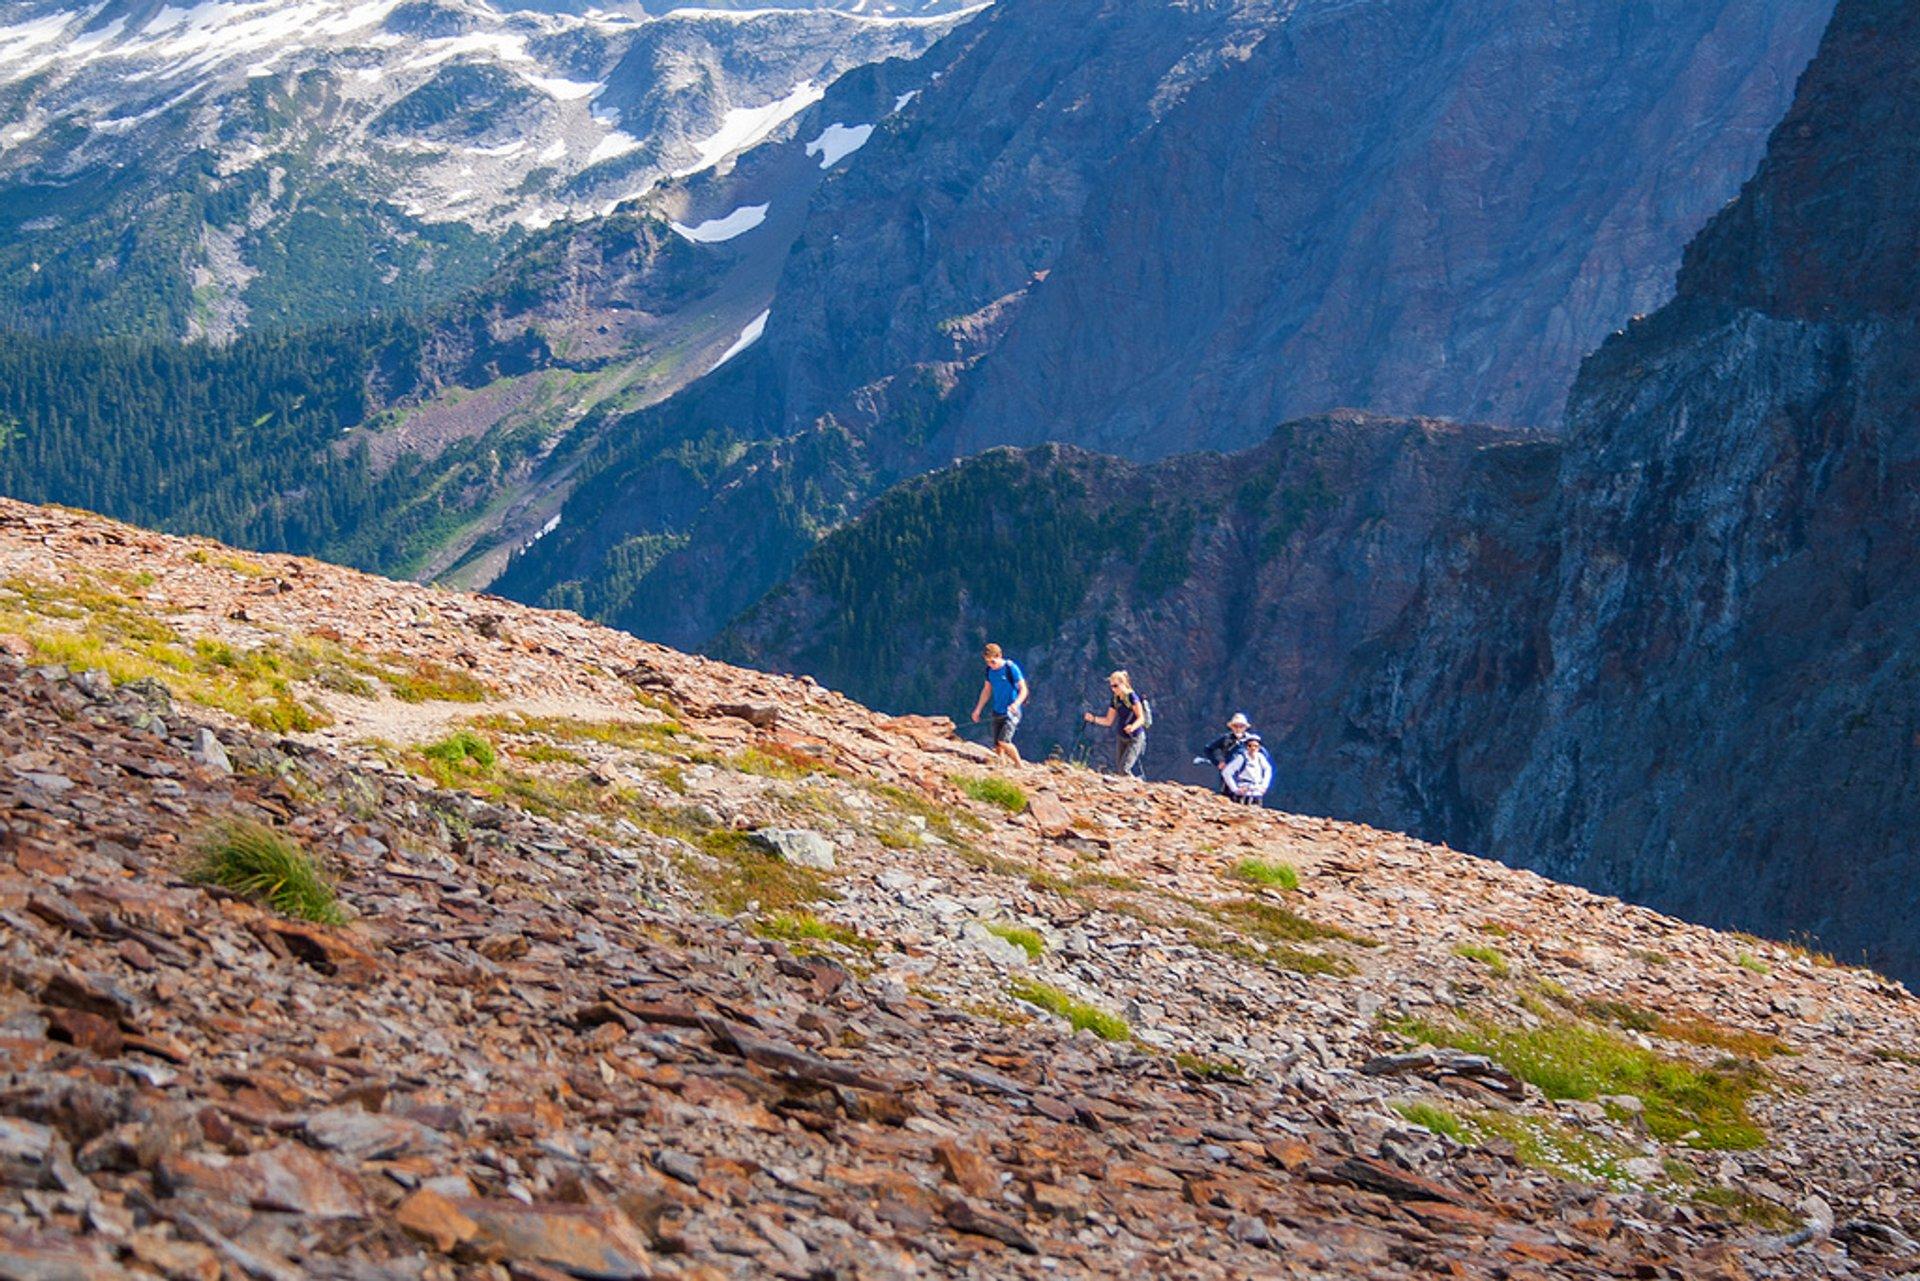 Mount Cheam in British Columbia - Best Season